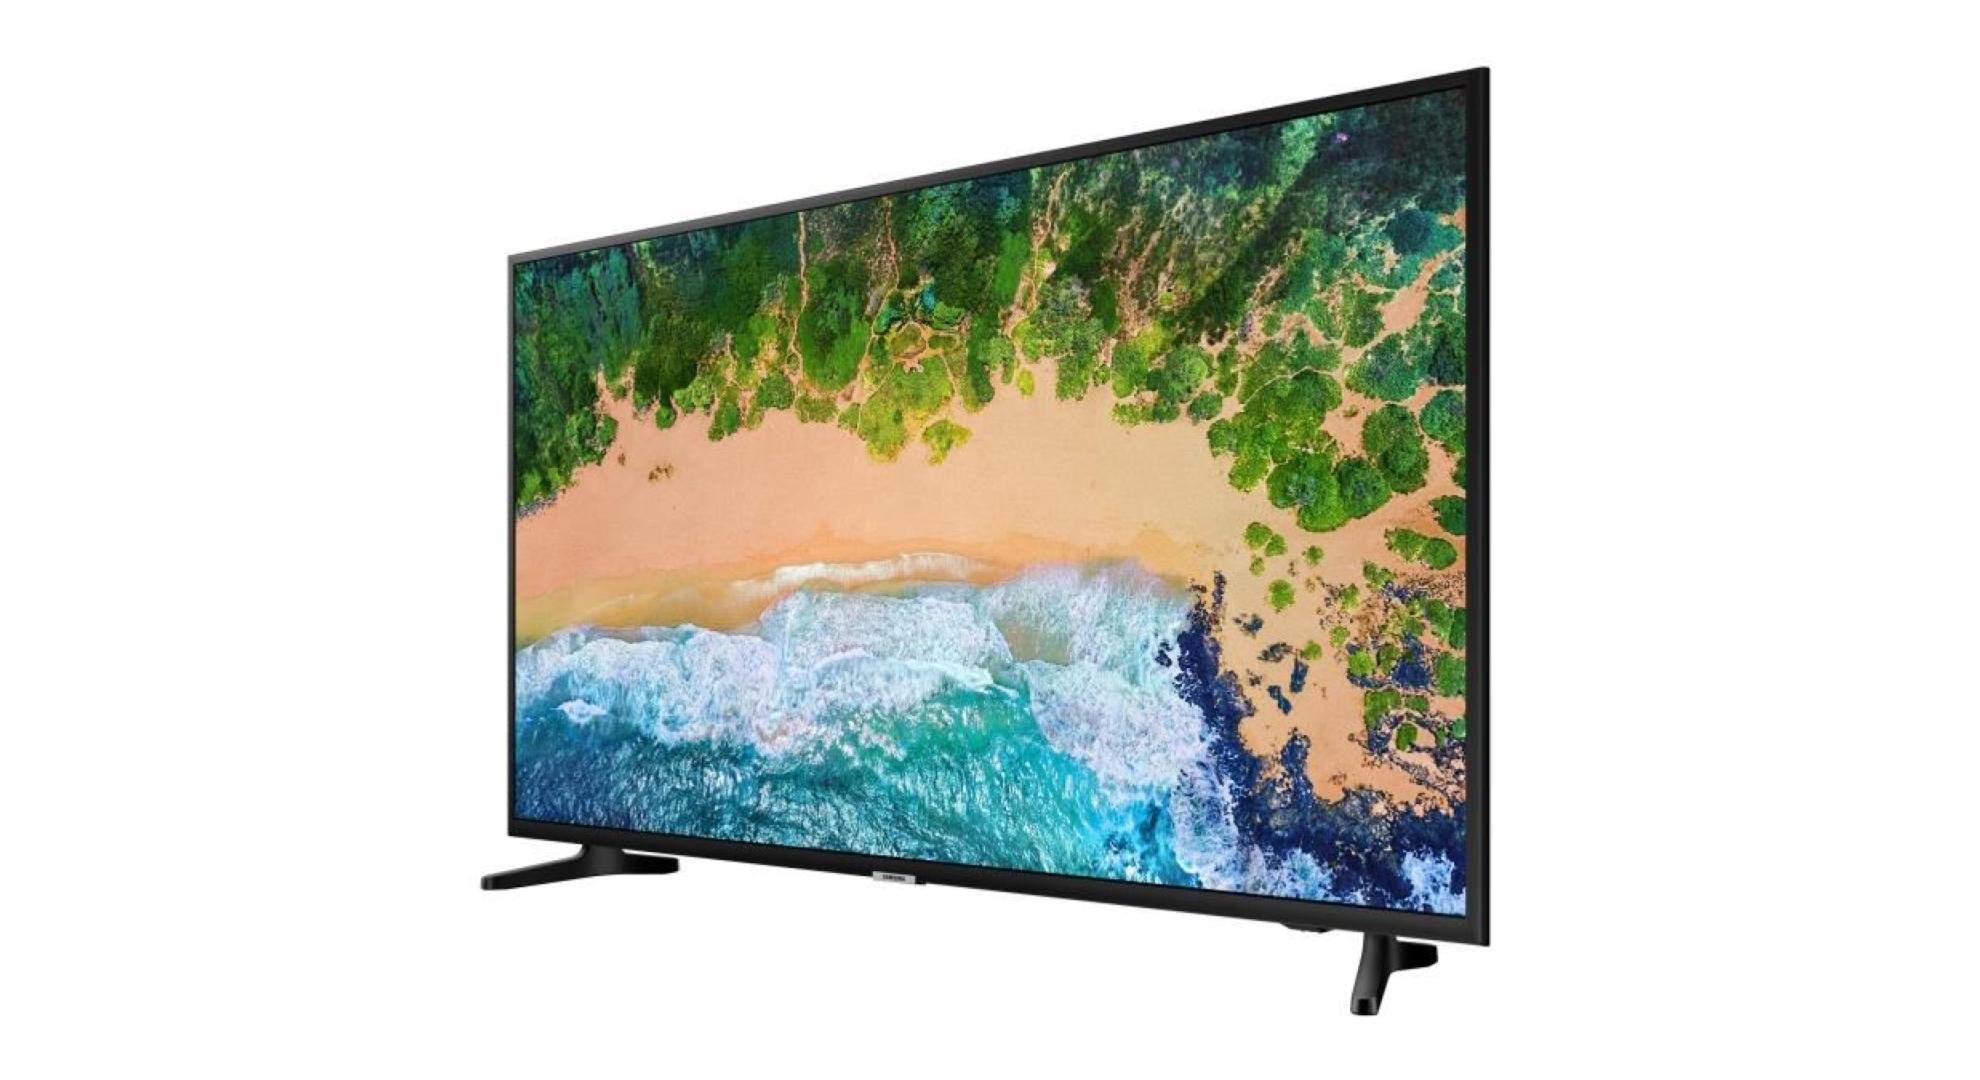 le deal du jour la tv led de samsung compatible 4k uhd. Black Bedroom Furniture Sets. Home Design Ideas